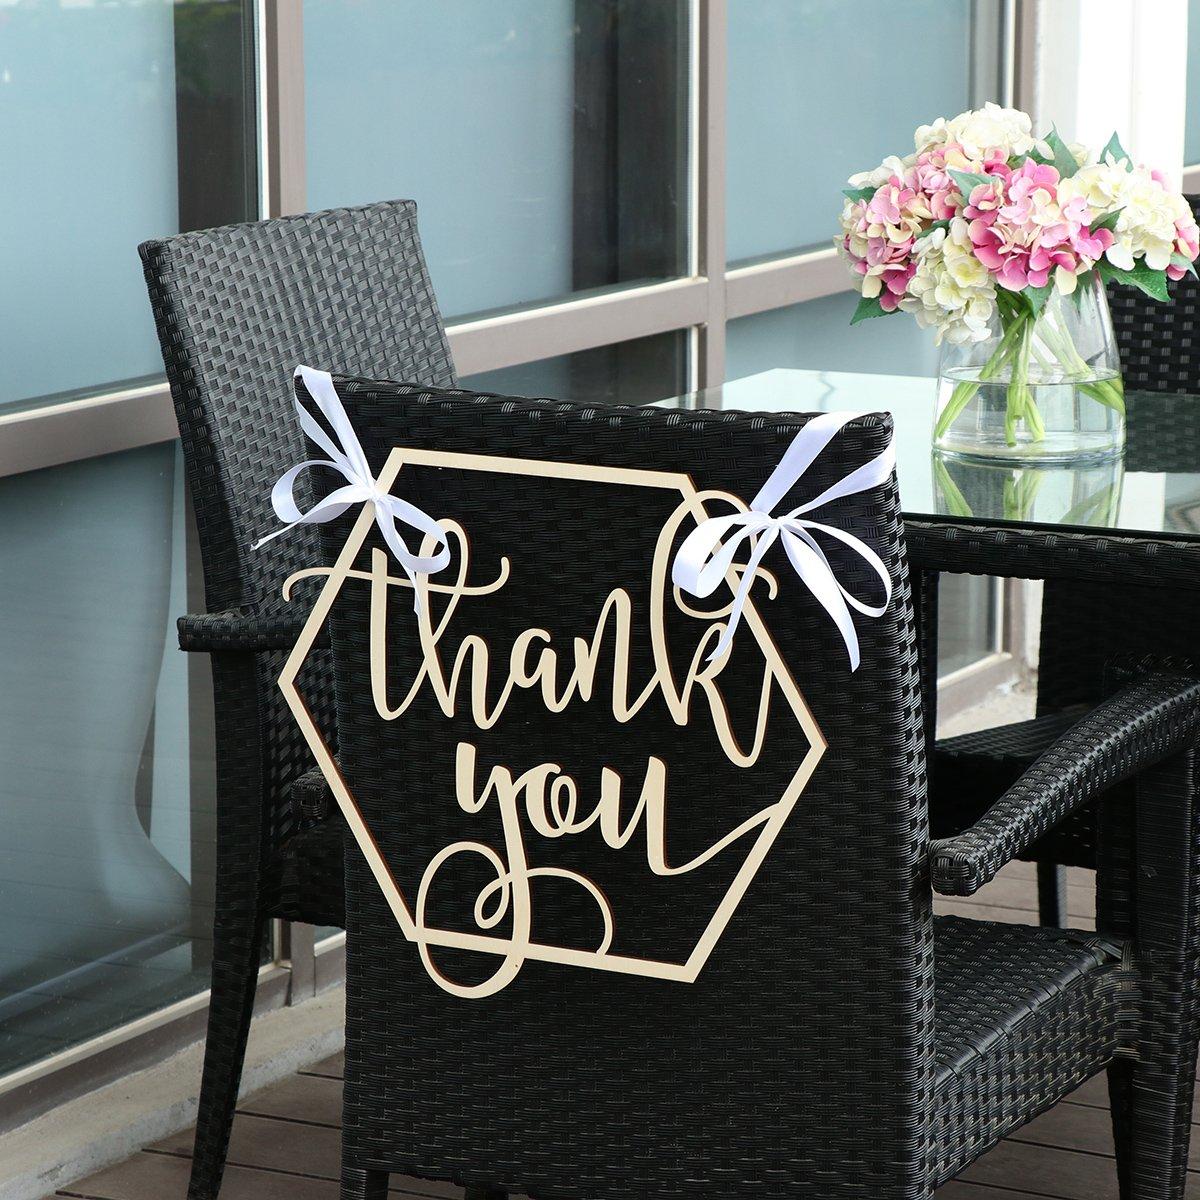 BESTOYARD Wedding Chair Banner Thank You Wood Sign Wedding Photo Booth Prop Wedding Party Decoration by BESTOYARD (Image #8)